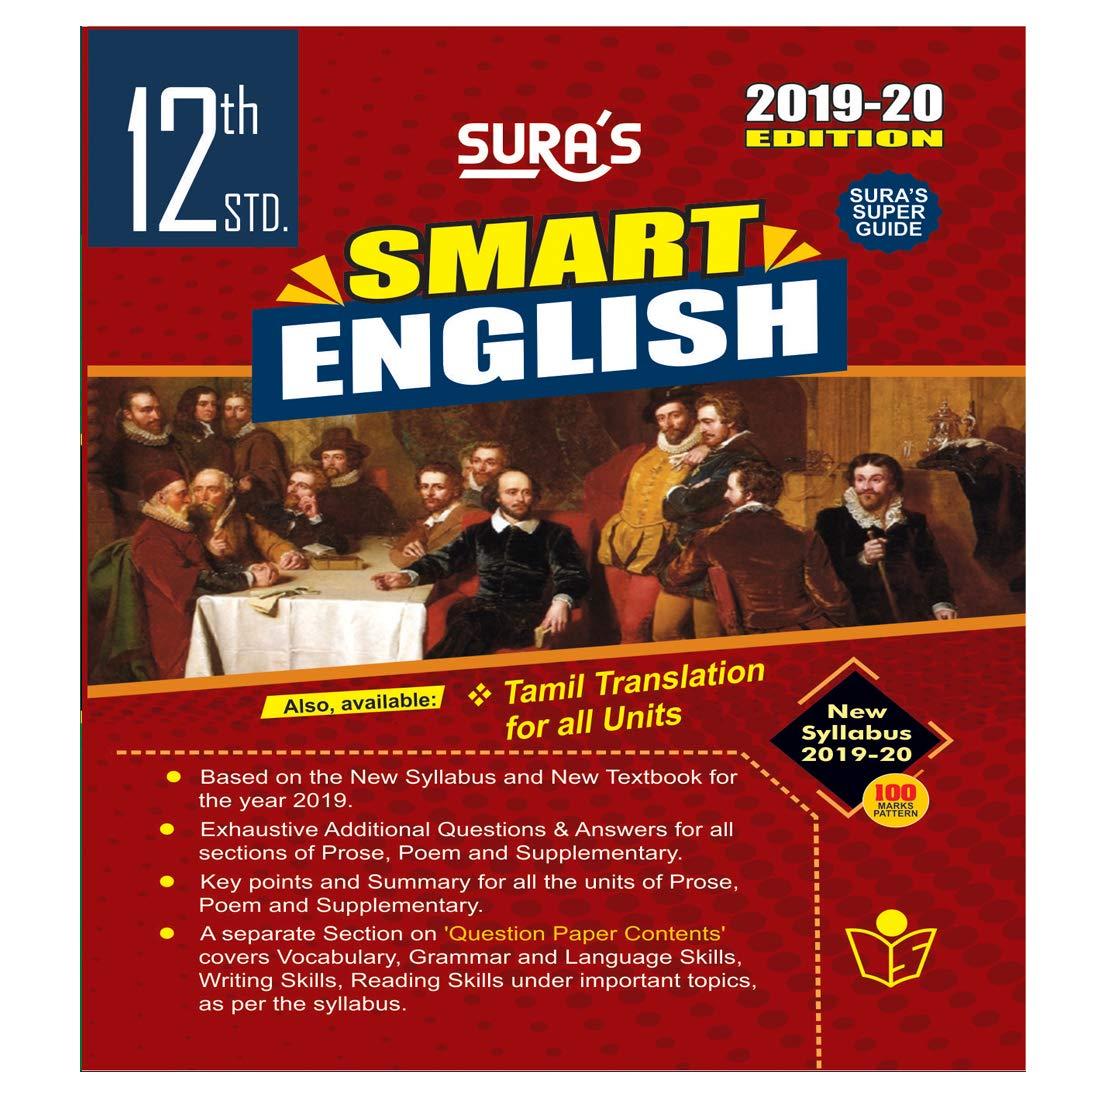 12th english guide pdf free download sura 2019